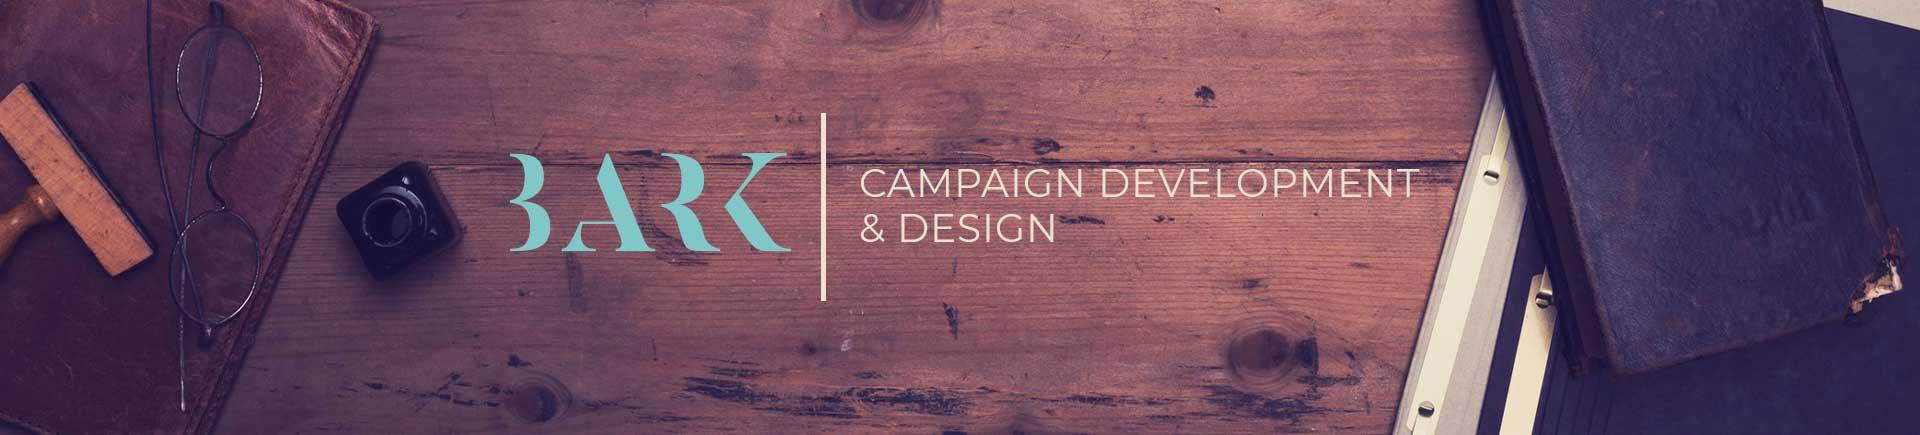 Campaign development for businesses